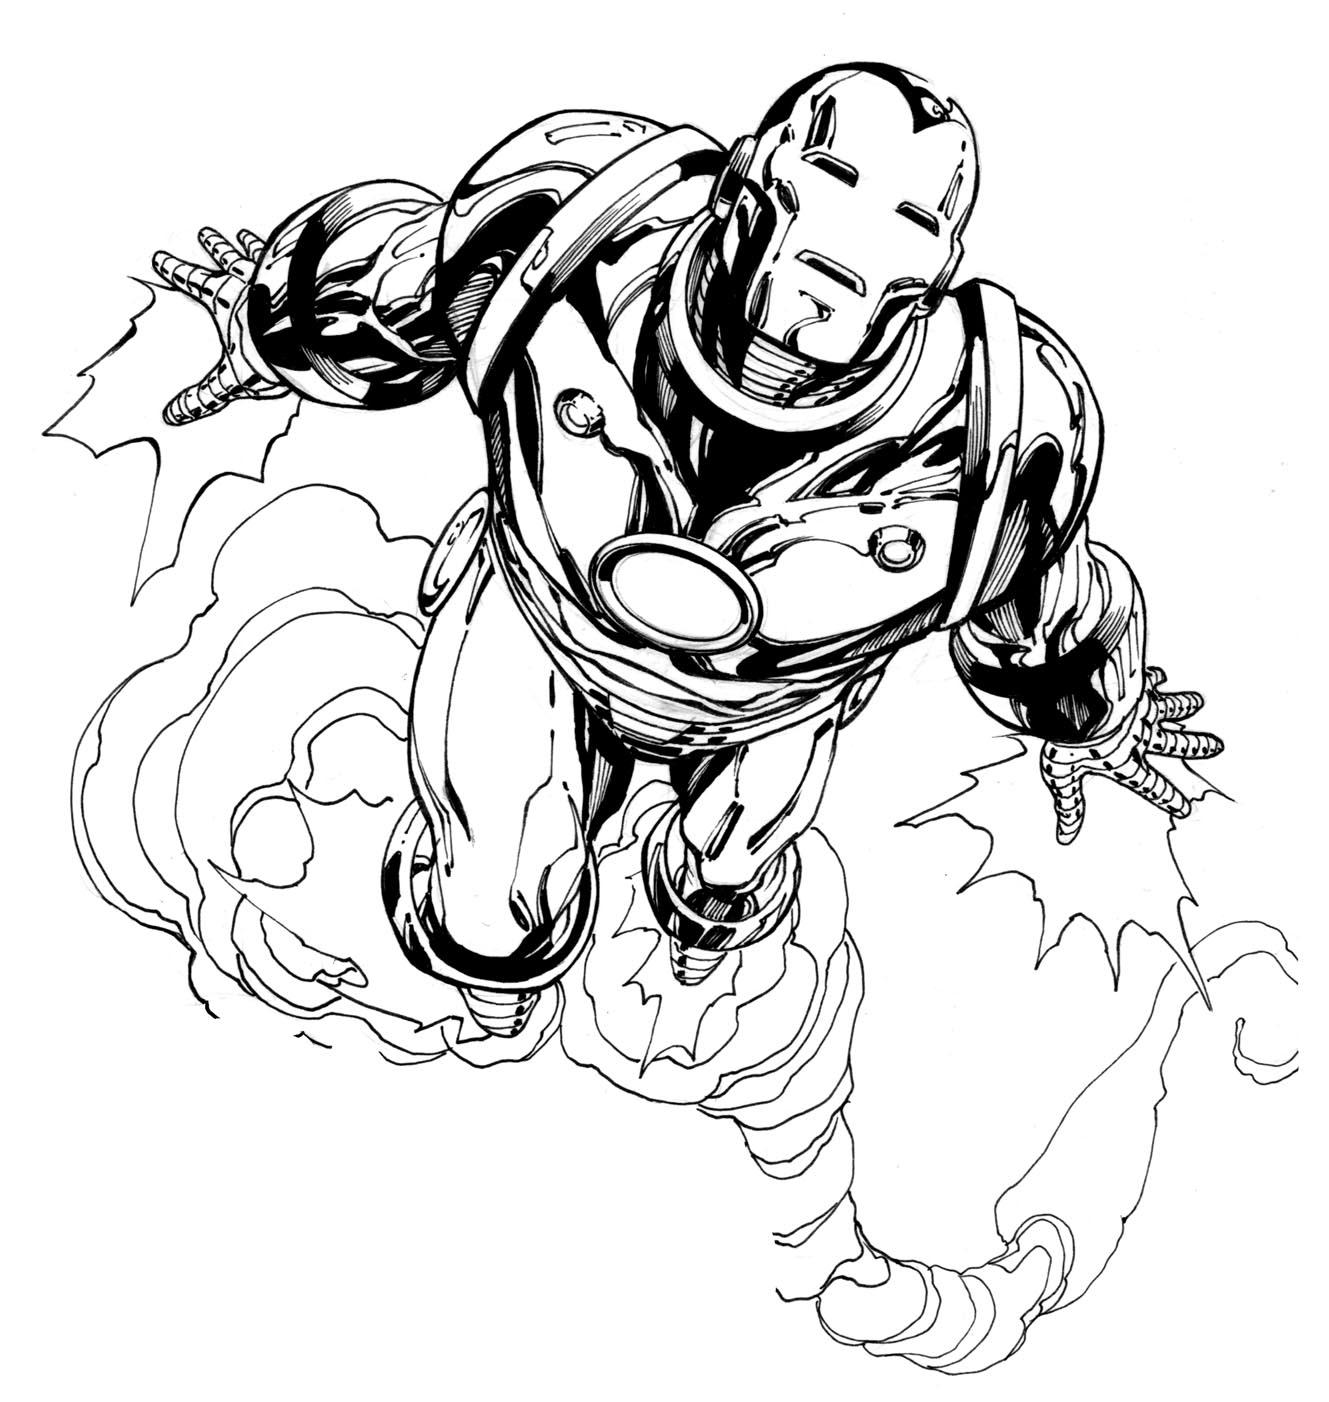 iron man coloring book iron man the avengers best coloring pages minister man book coloring iron